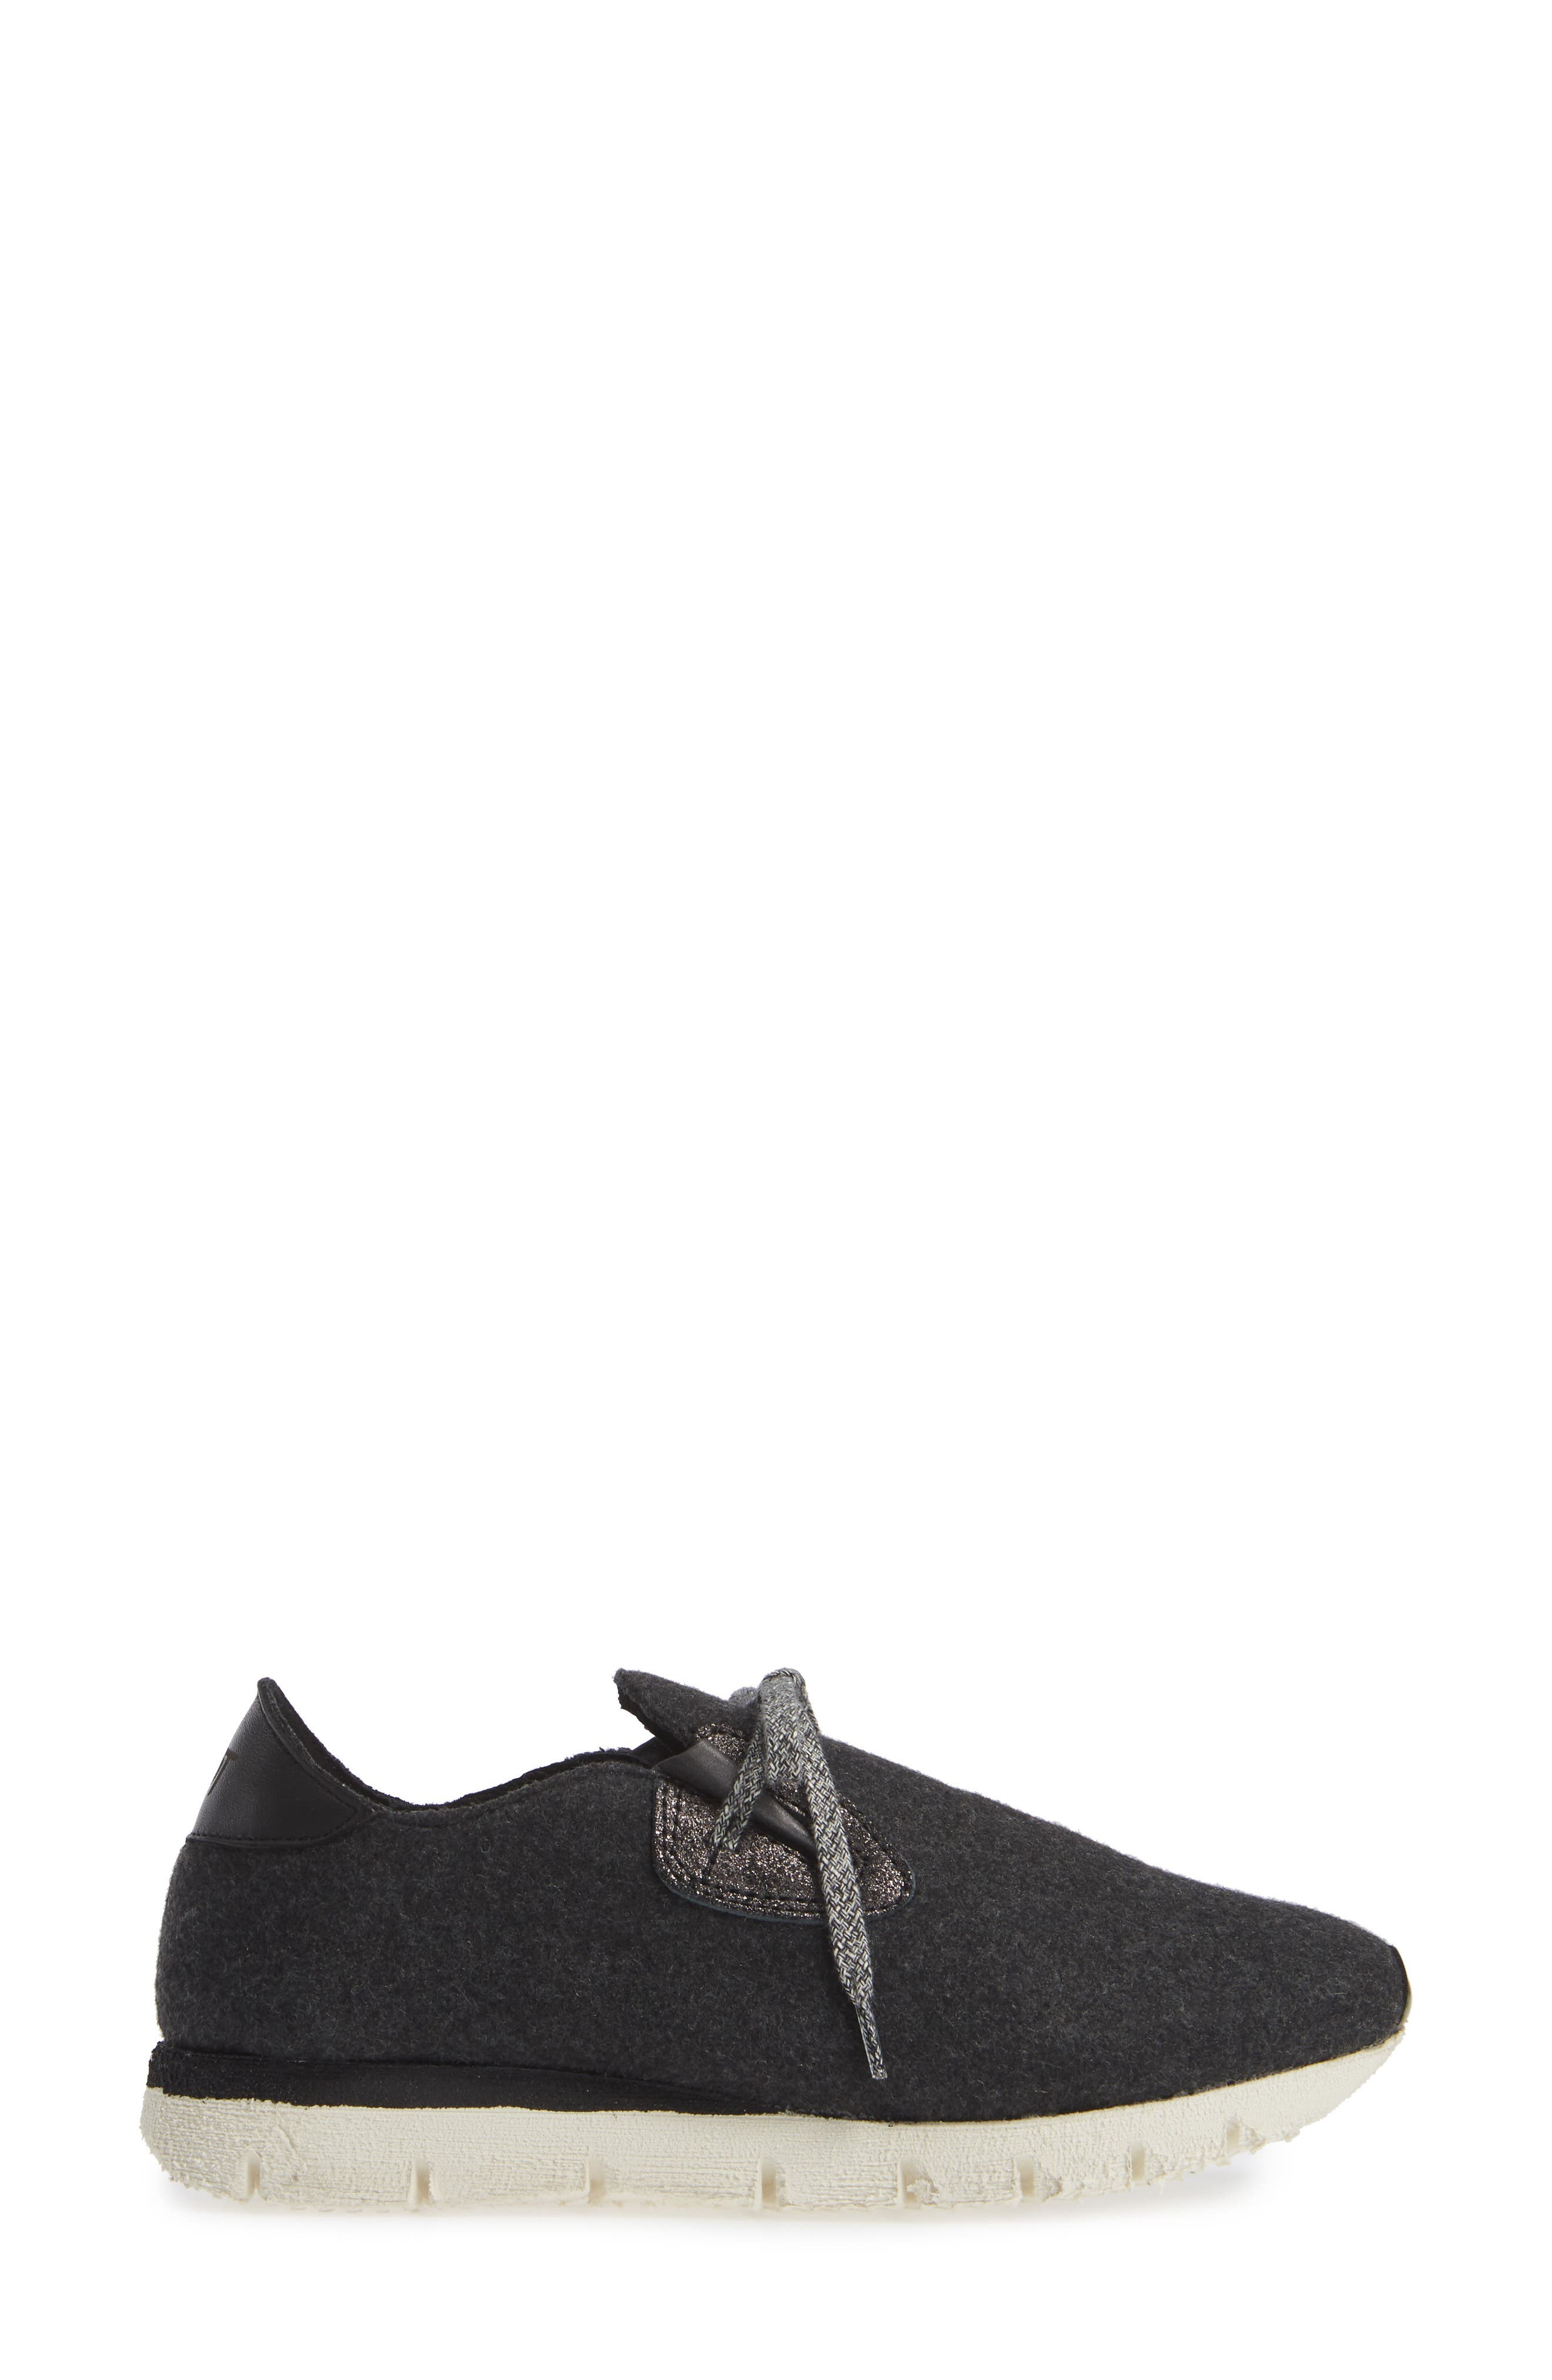 Radius Sneaker,                             Alternate thumbnail 3, color,                             CHARCOAL